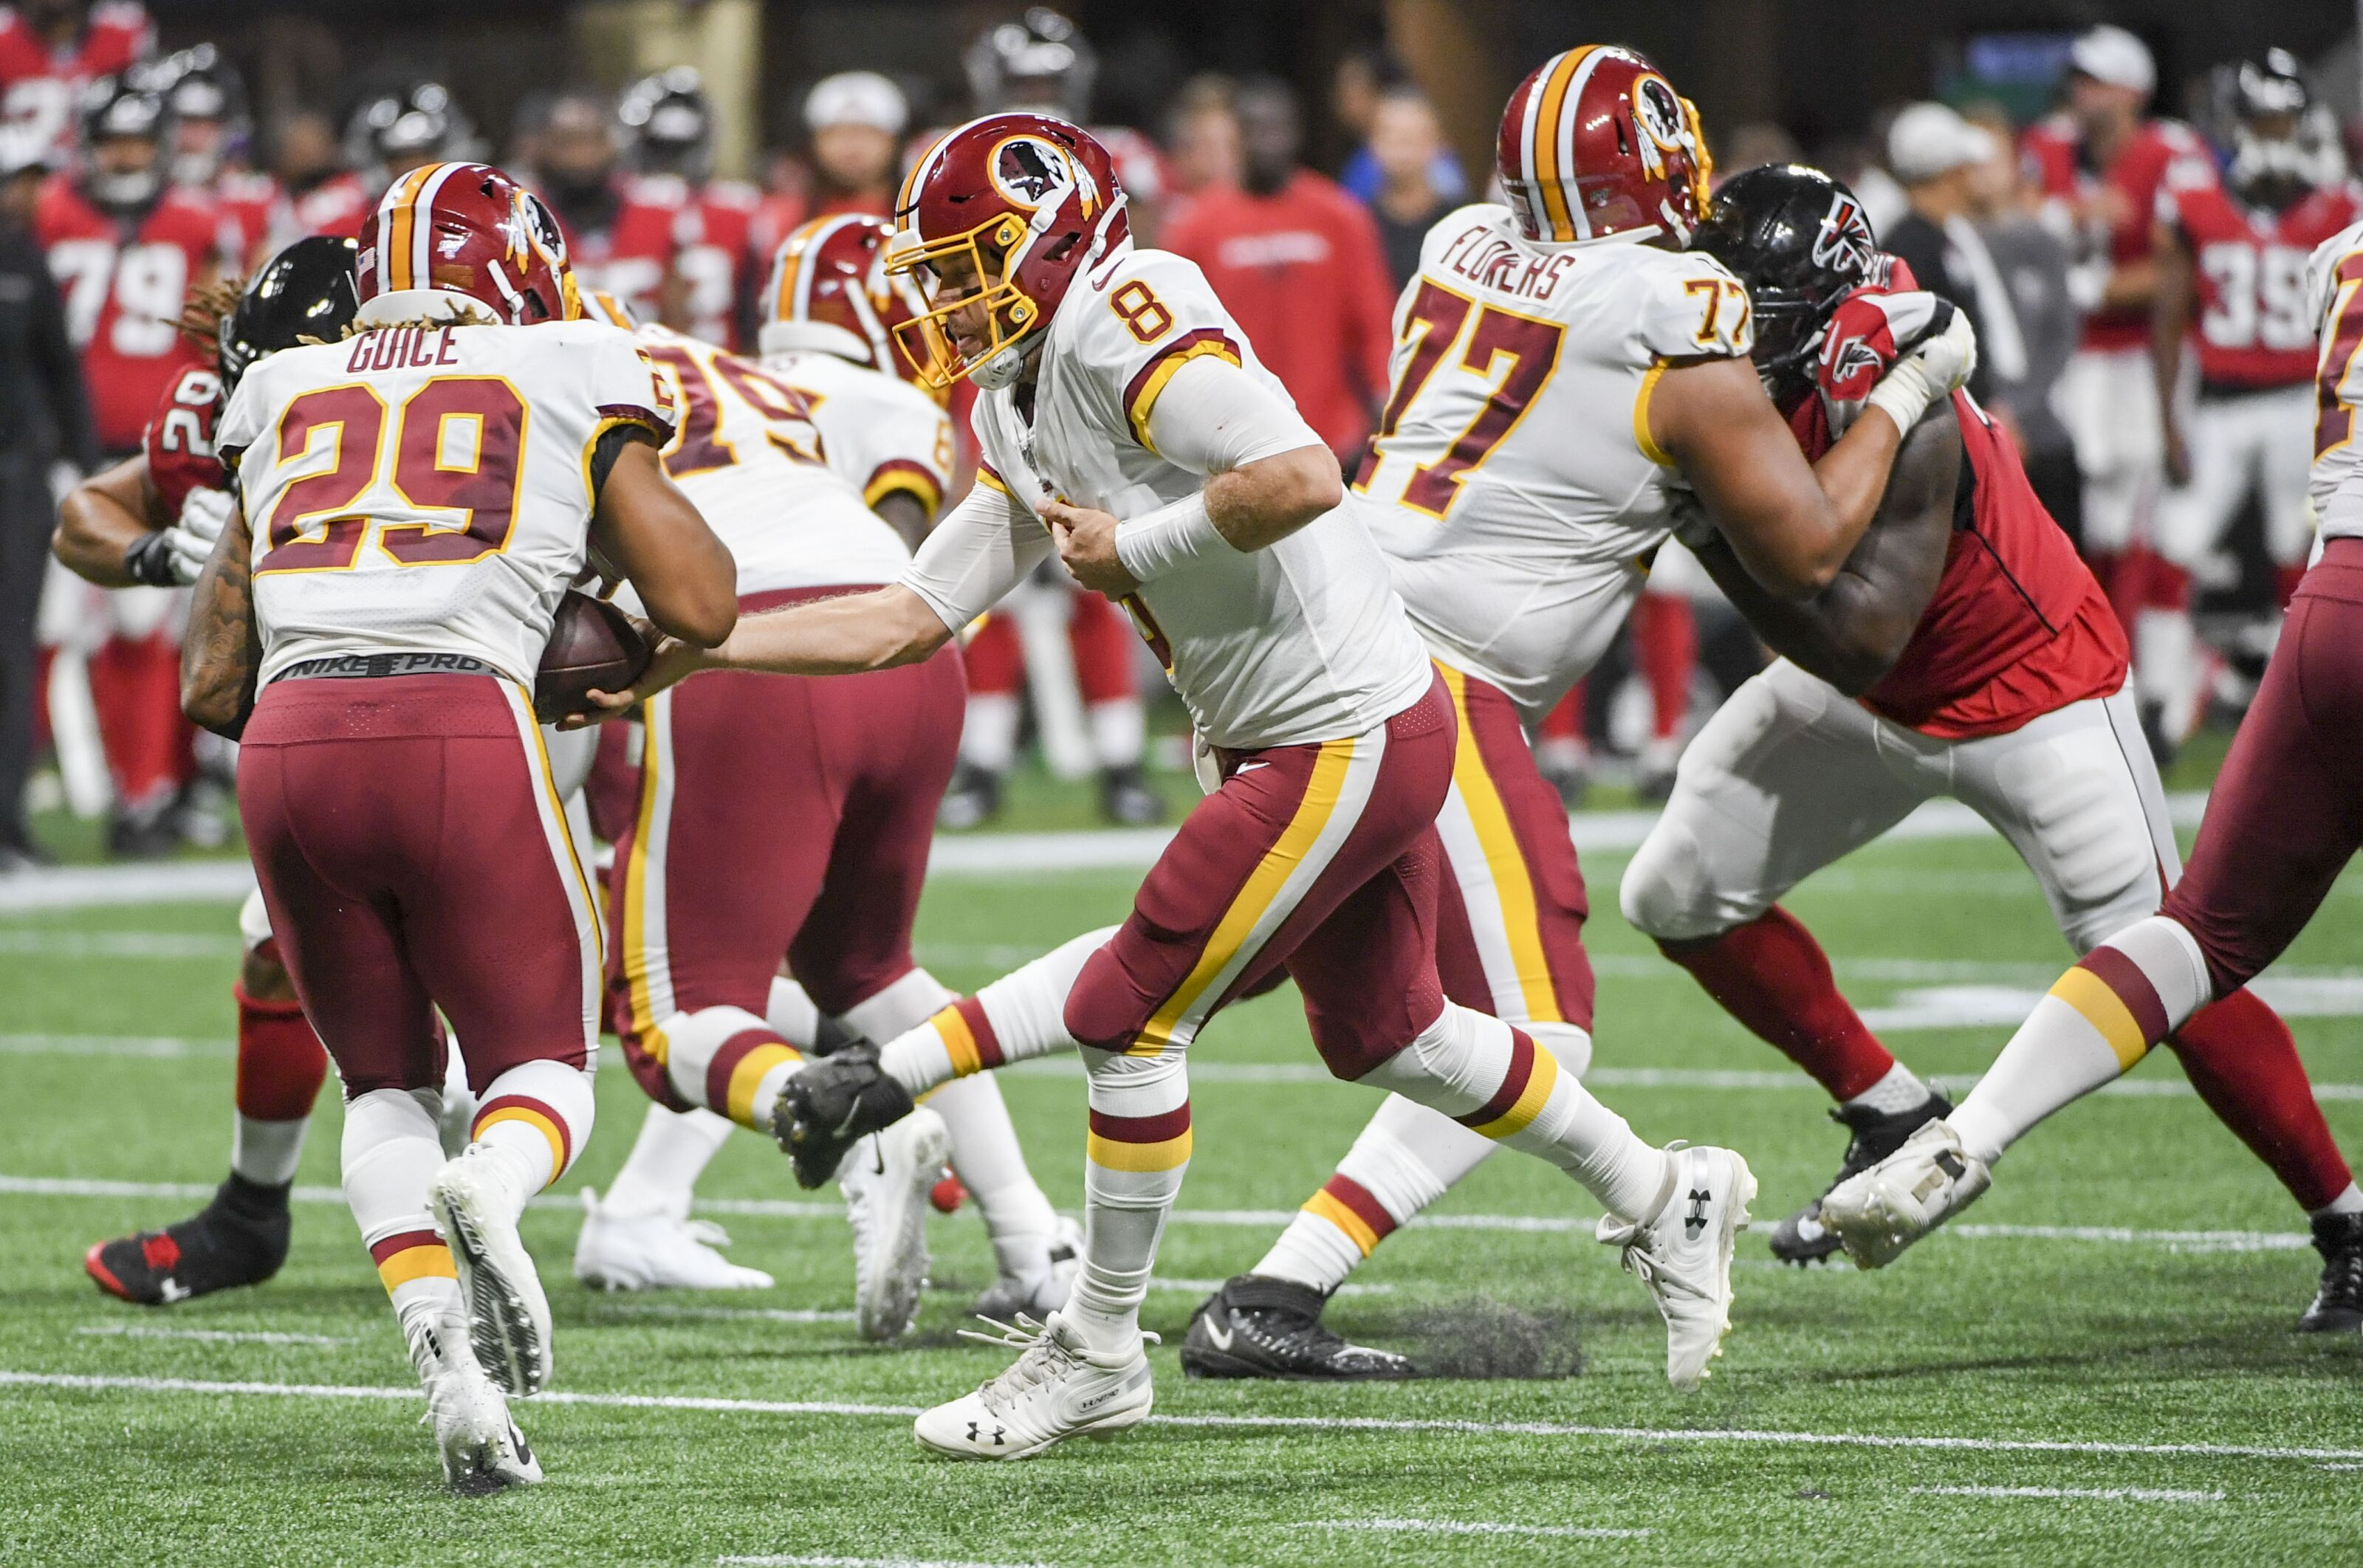 nfl quarterback rankings 2019 2020 season - HD3200×2124